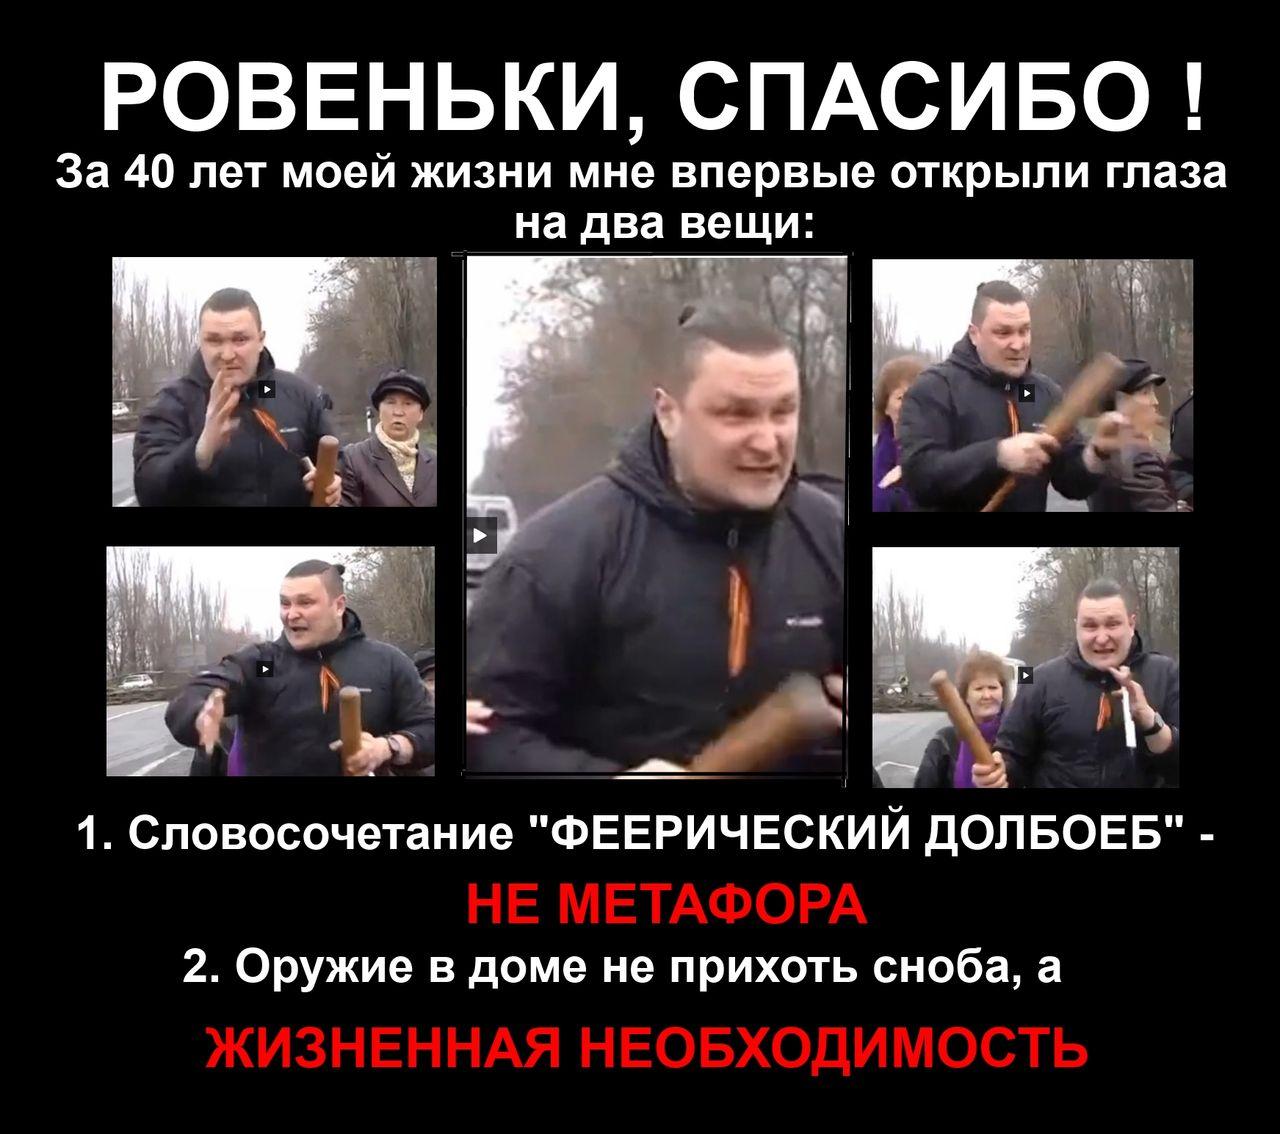 Руководство и журналистов НТКУ осудили за ложь во время Евромайдана - Цензор.НЕТ 928